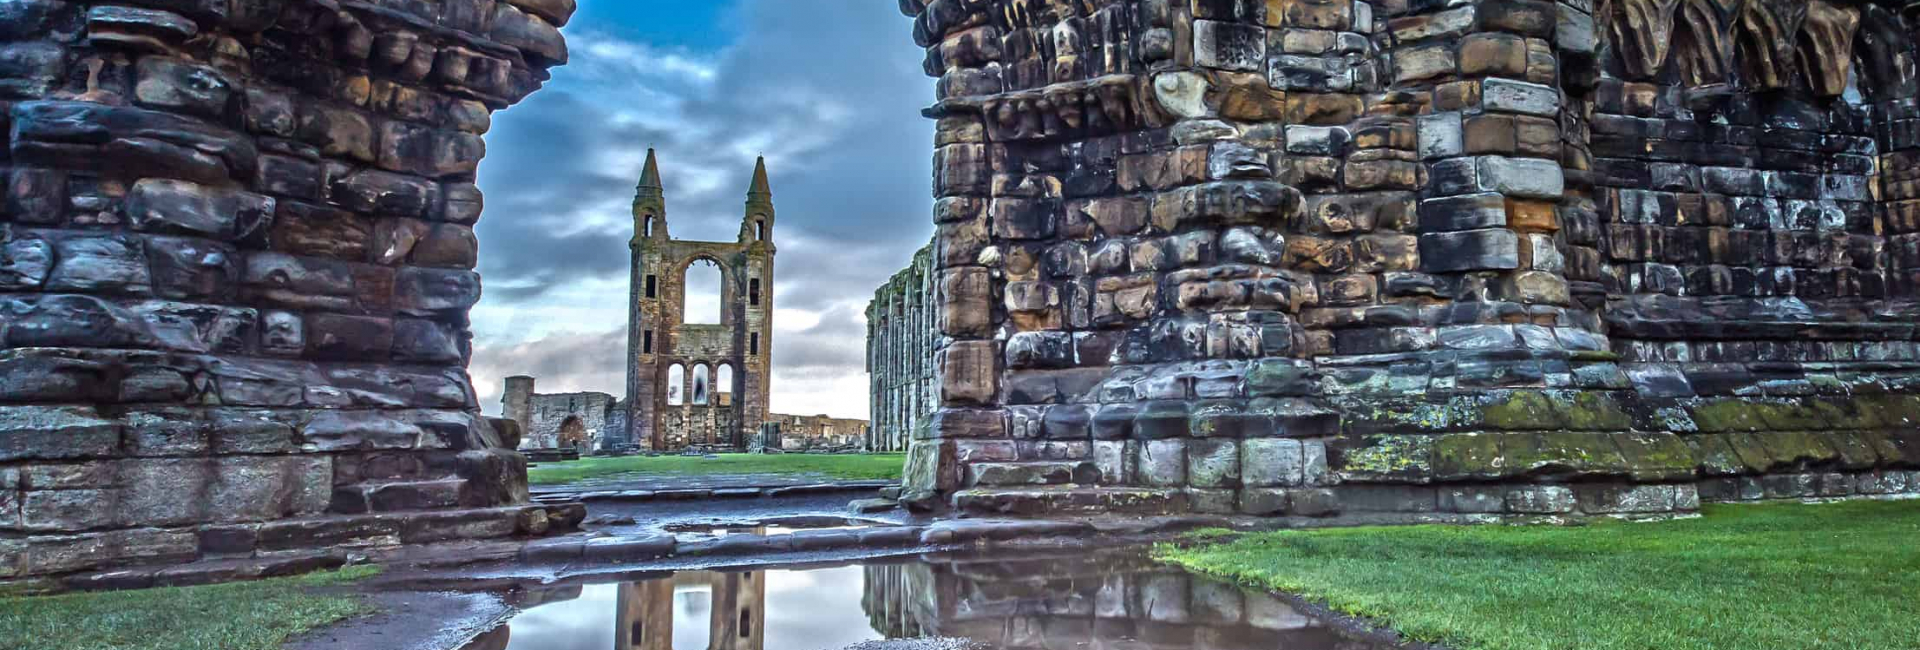 Ruinerne ved St. Andrew katedralen i Skotland